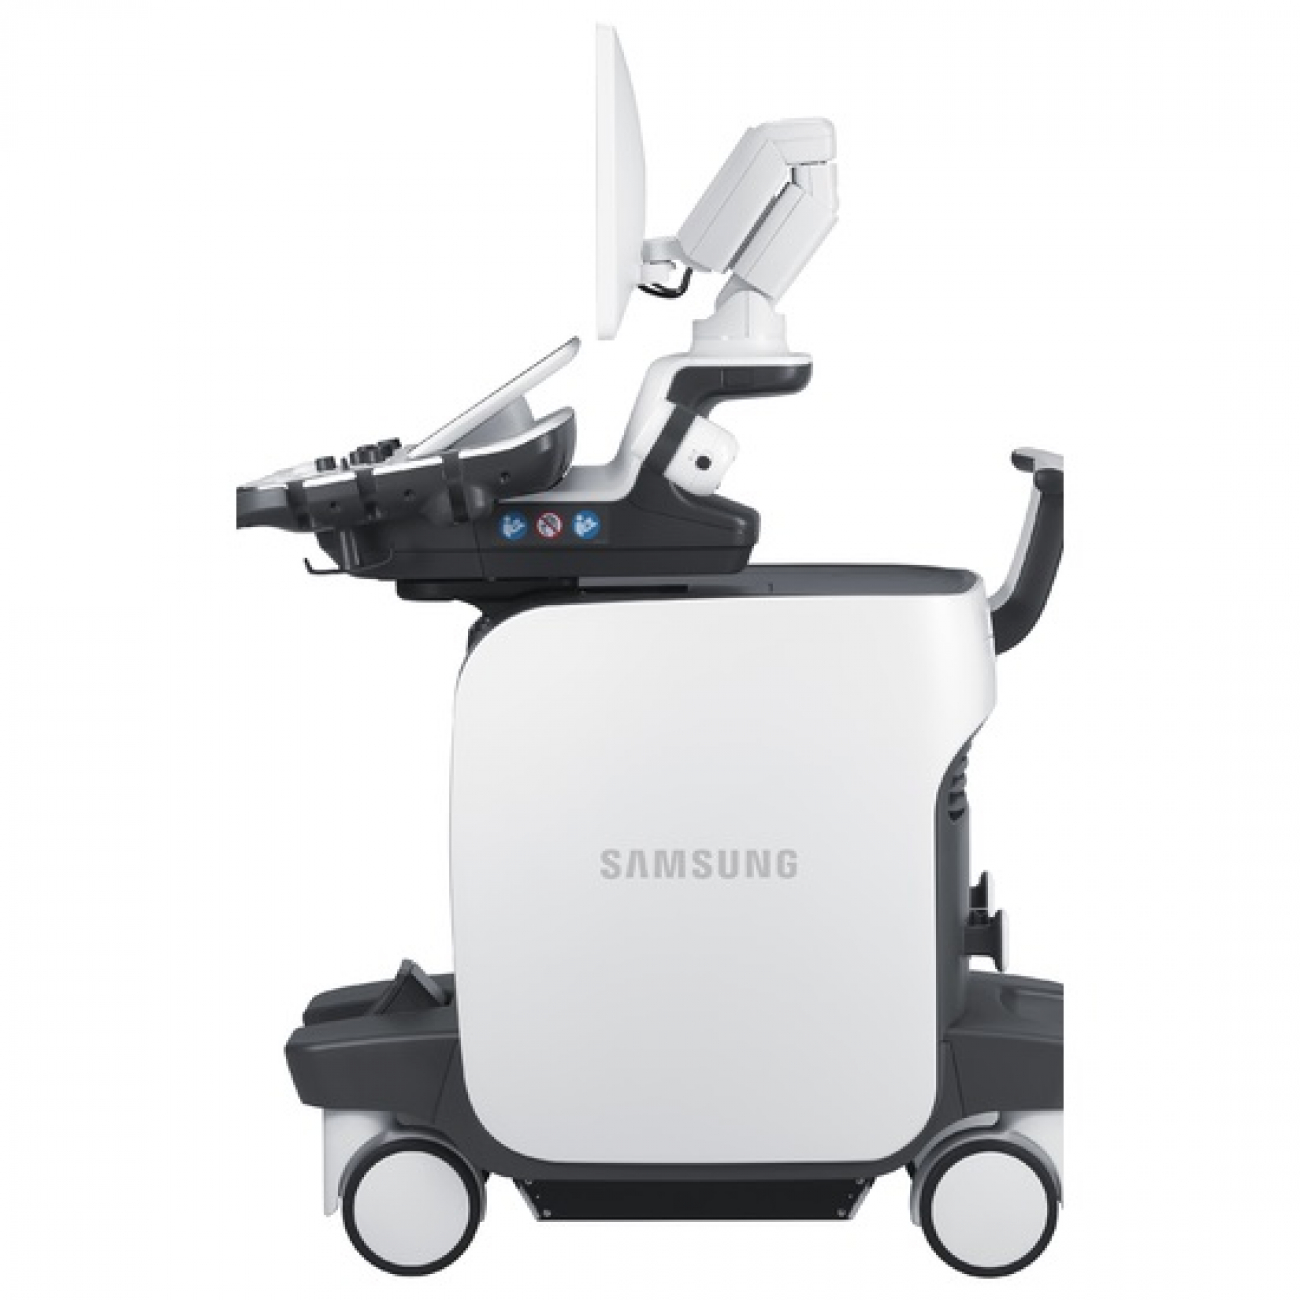 Samsung Medison RS80